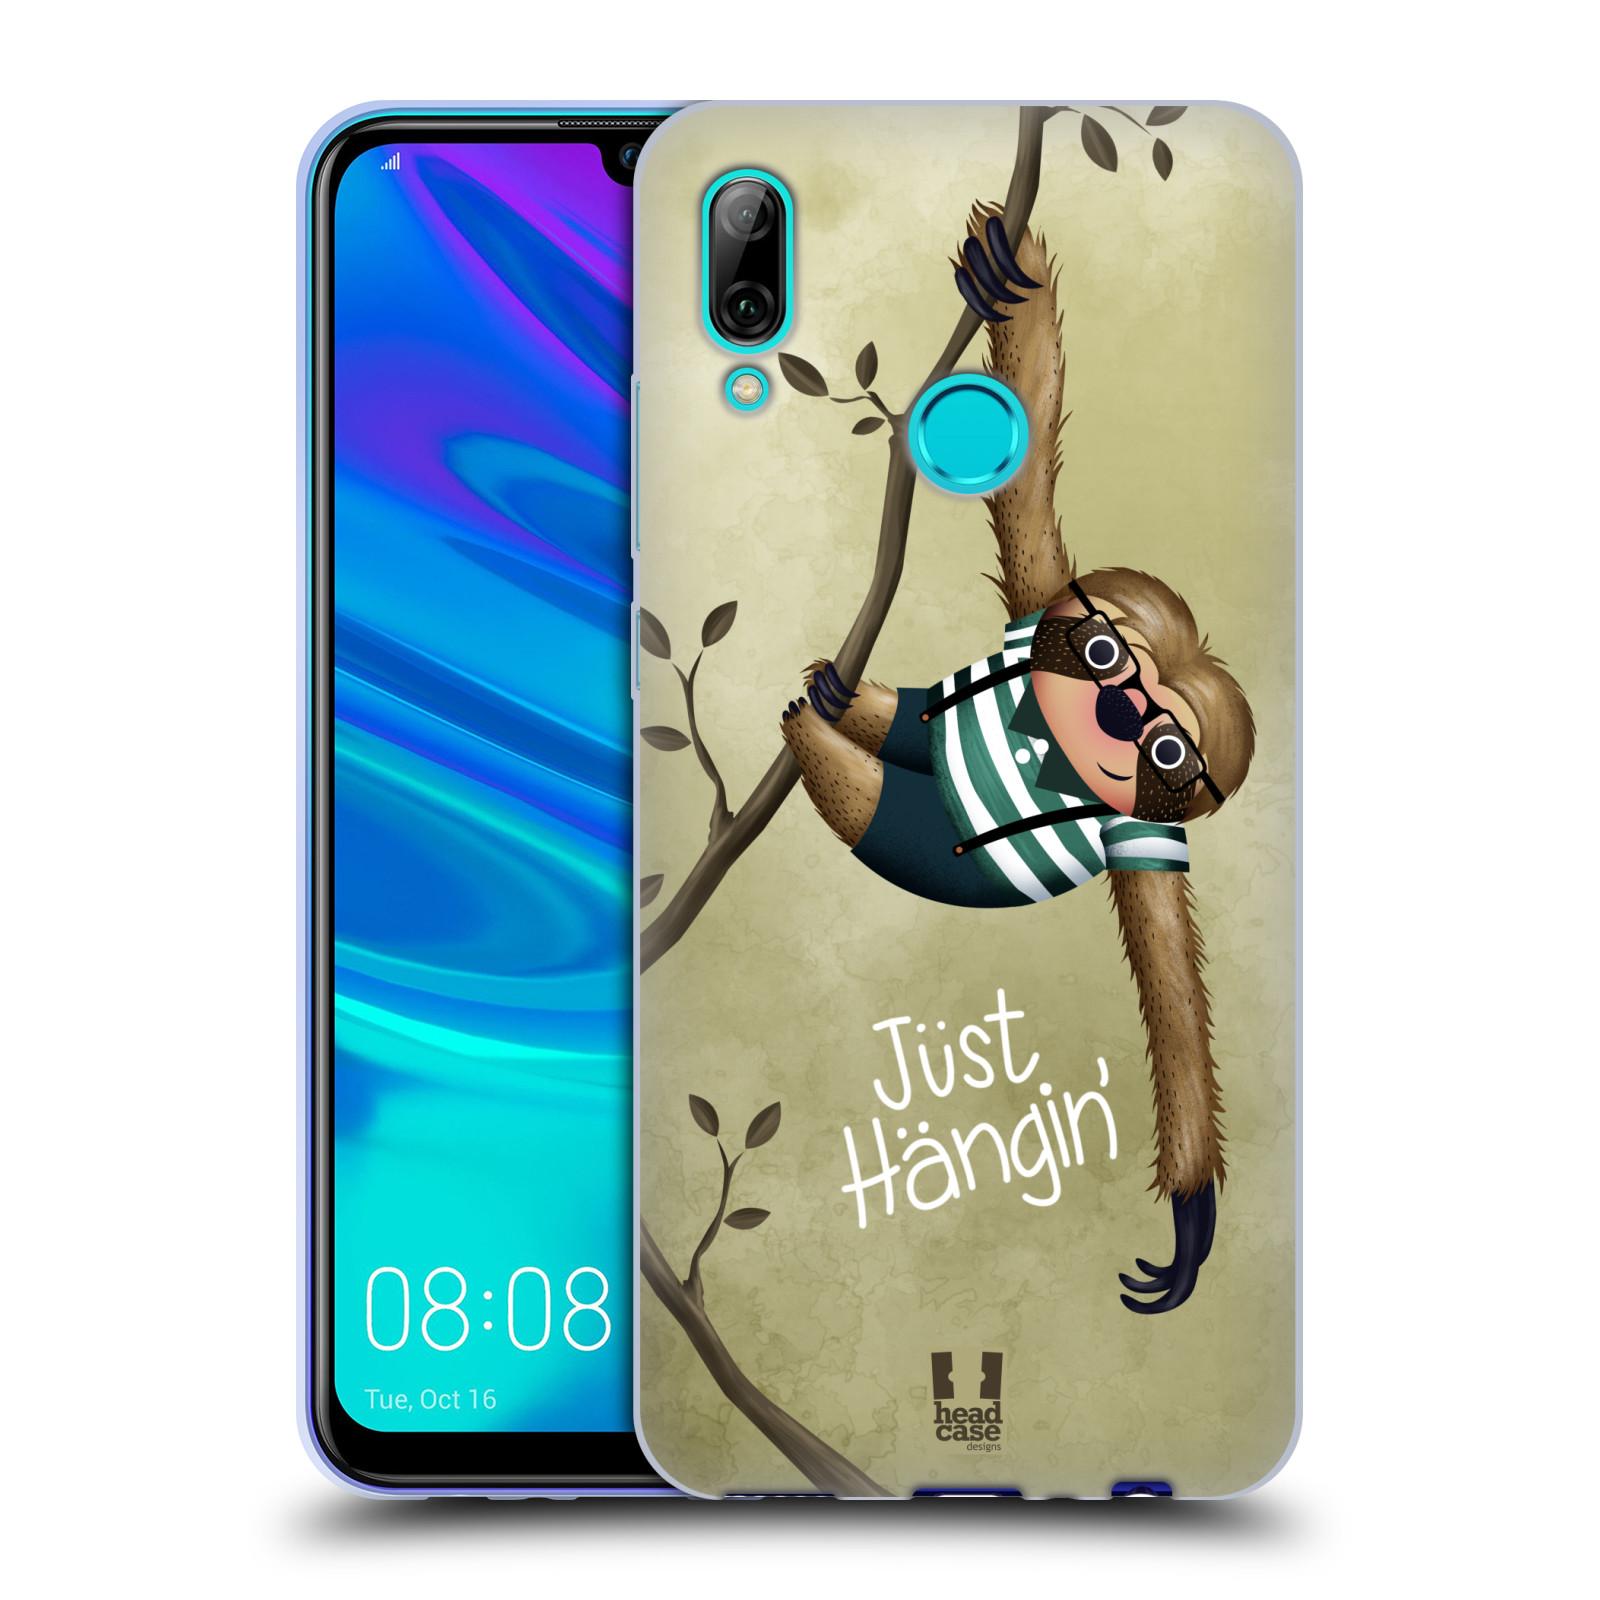 Silikonové pouzdro na mobil Huawei P Smart (2019) - Head Case - Lenochod Just Hangin